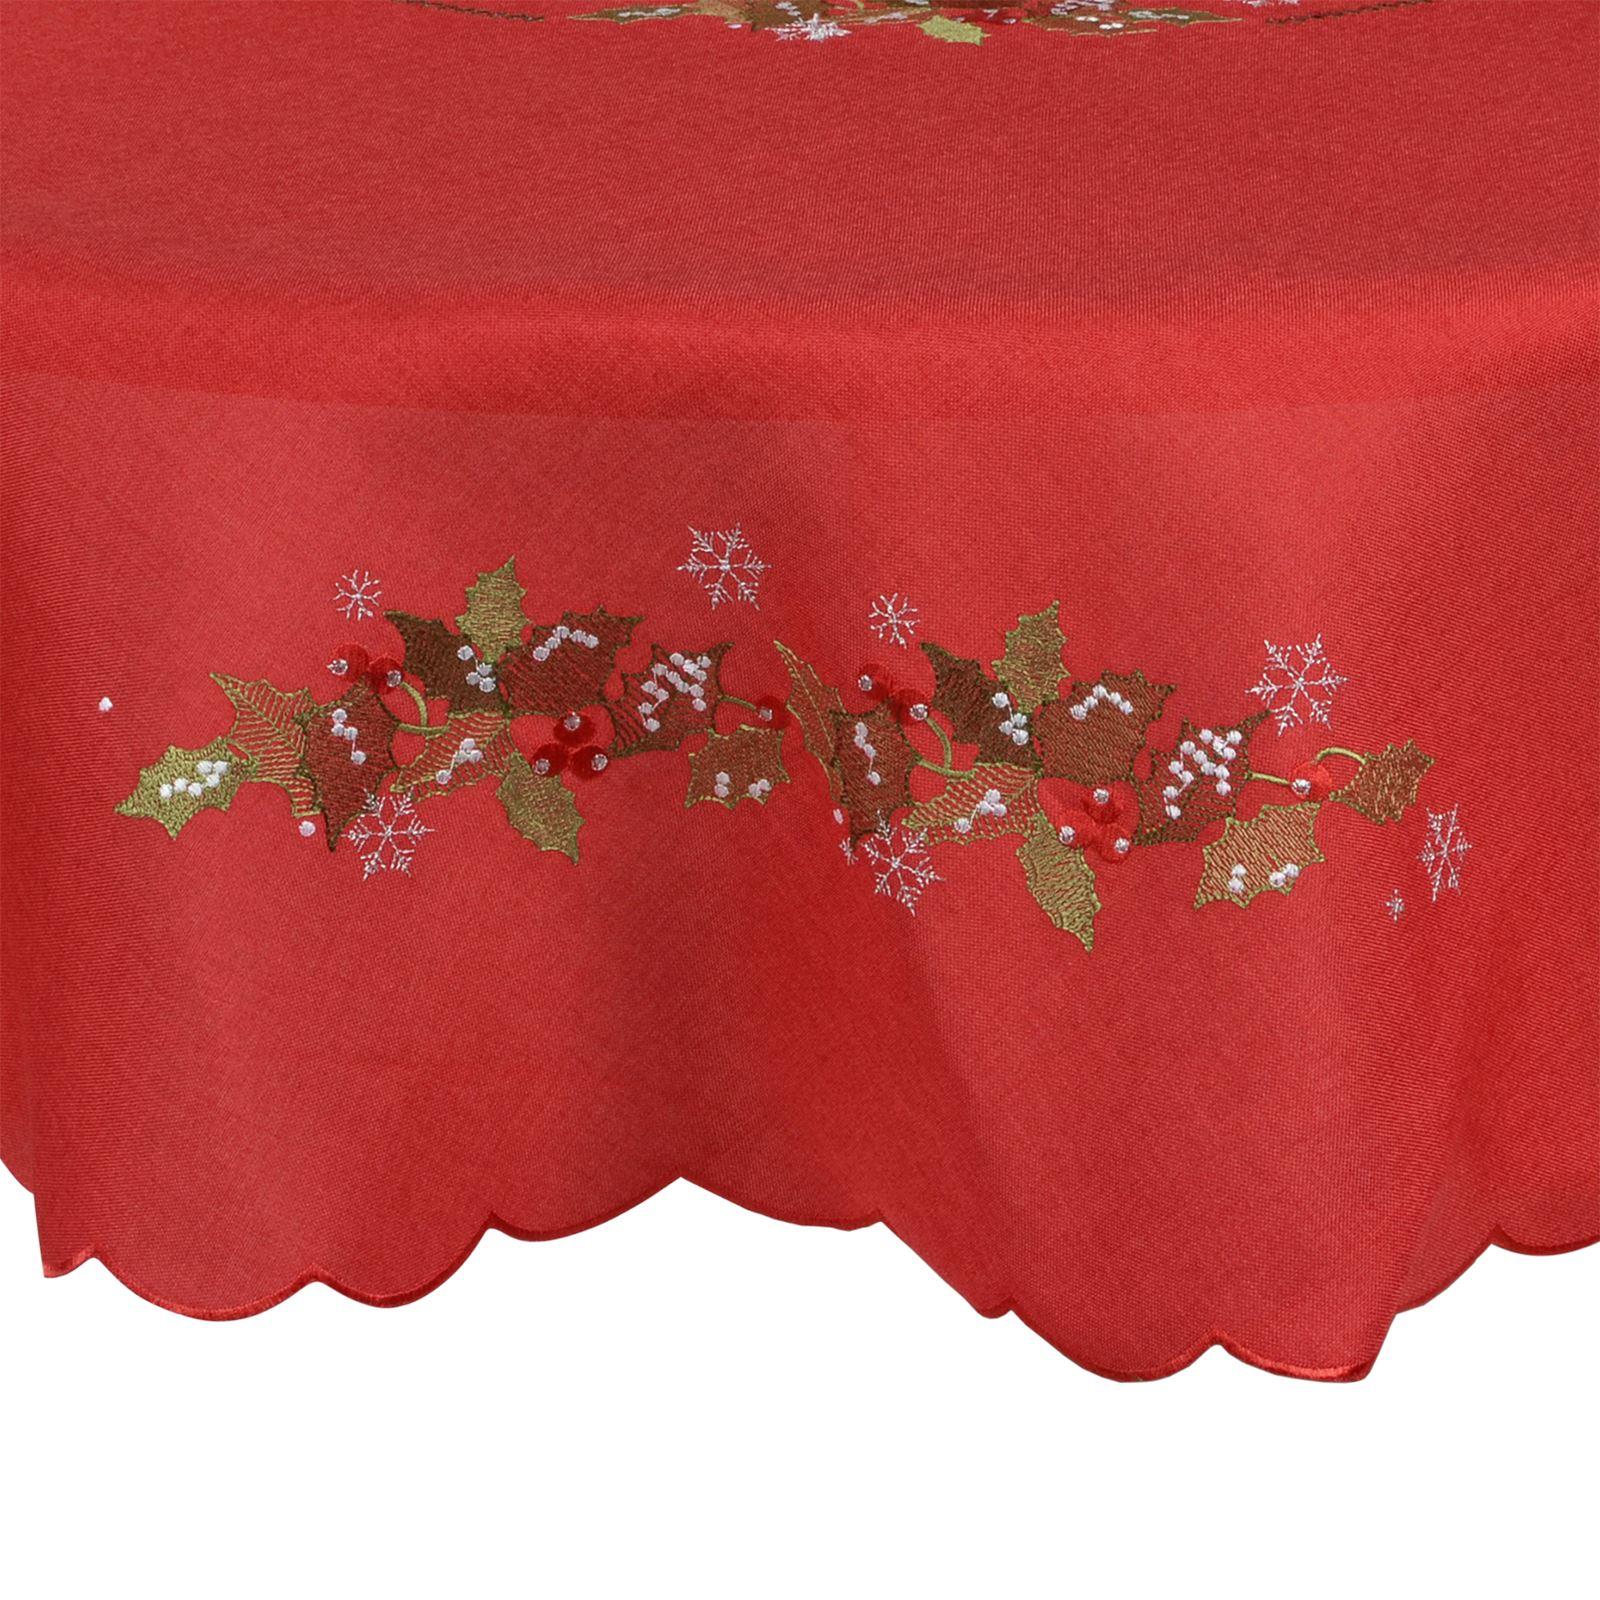 Christmas-Tablecloth-Festive-Pattern-Rectangle-Round-Fabric-Xmas-Room-Decoration Indexbild 90